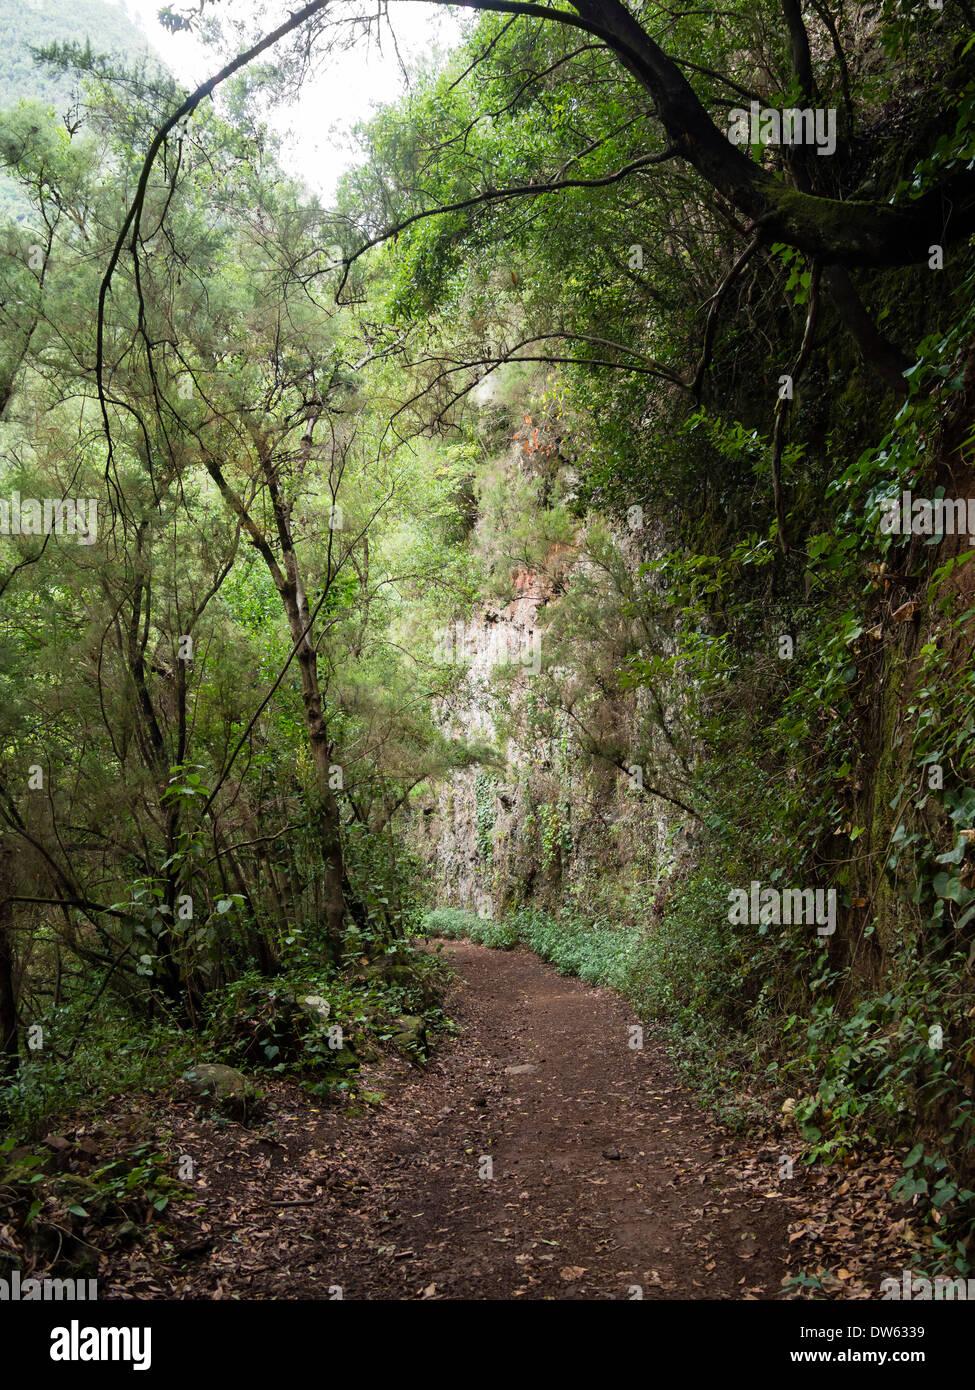 "Der Wanderweg zum Aussichtspunkt ""Mirador del Espigon Atravesado"" in der Laurel Wald Los Tiles / Los Tilos, La Palma Stockbild"